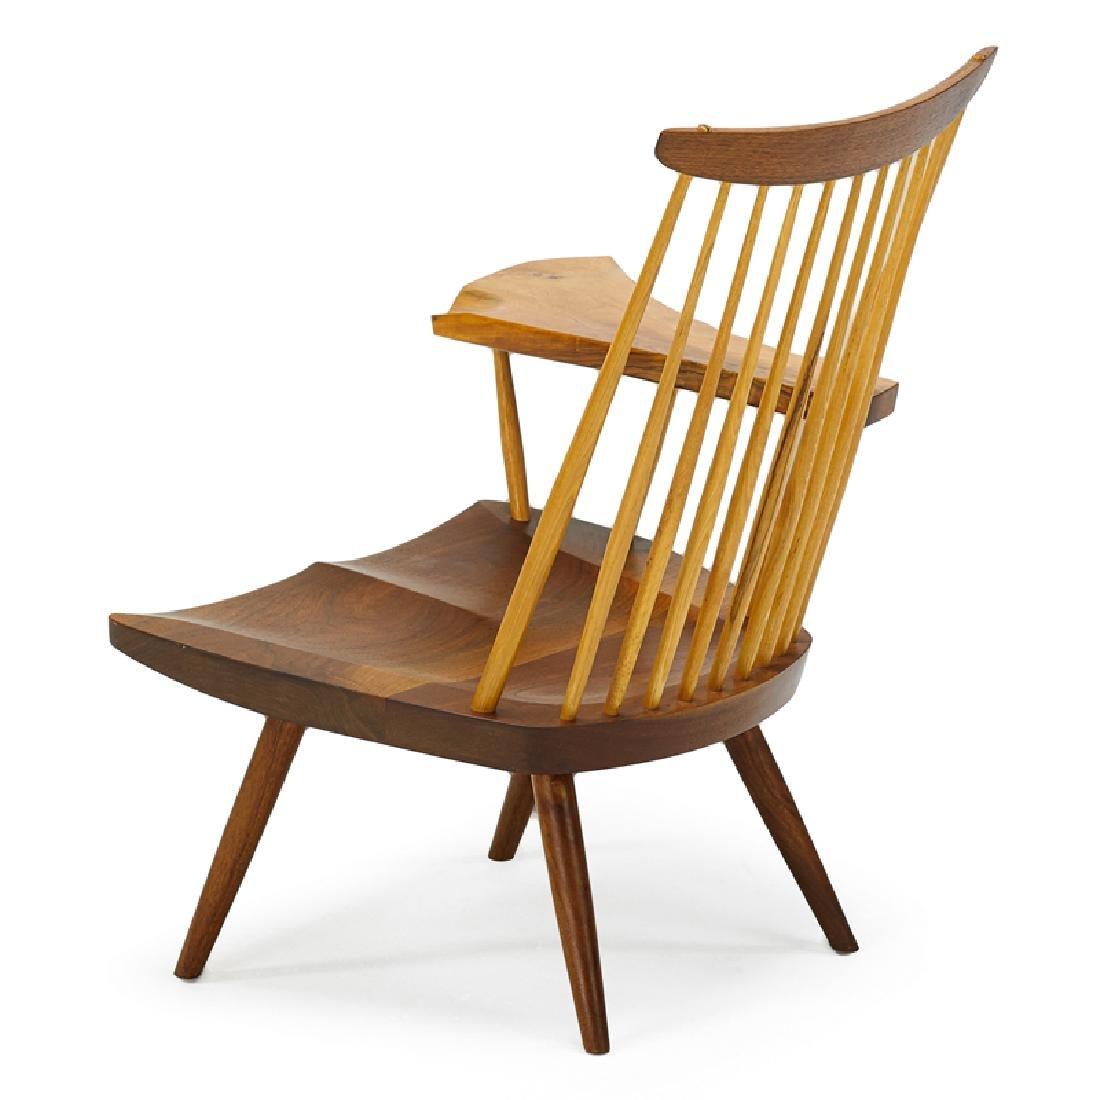 MIRA NAKASHIMA New Chair with Arm - 2